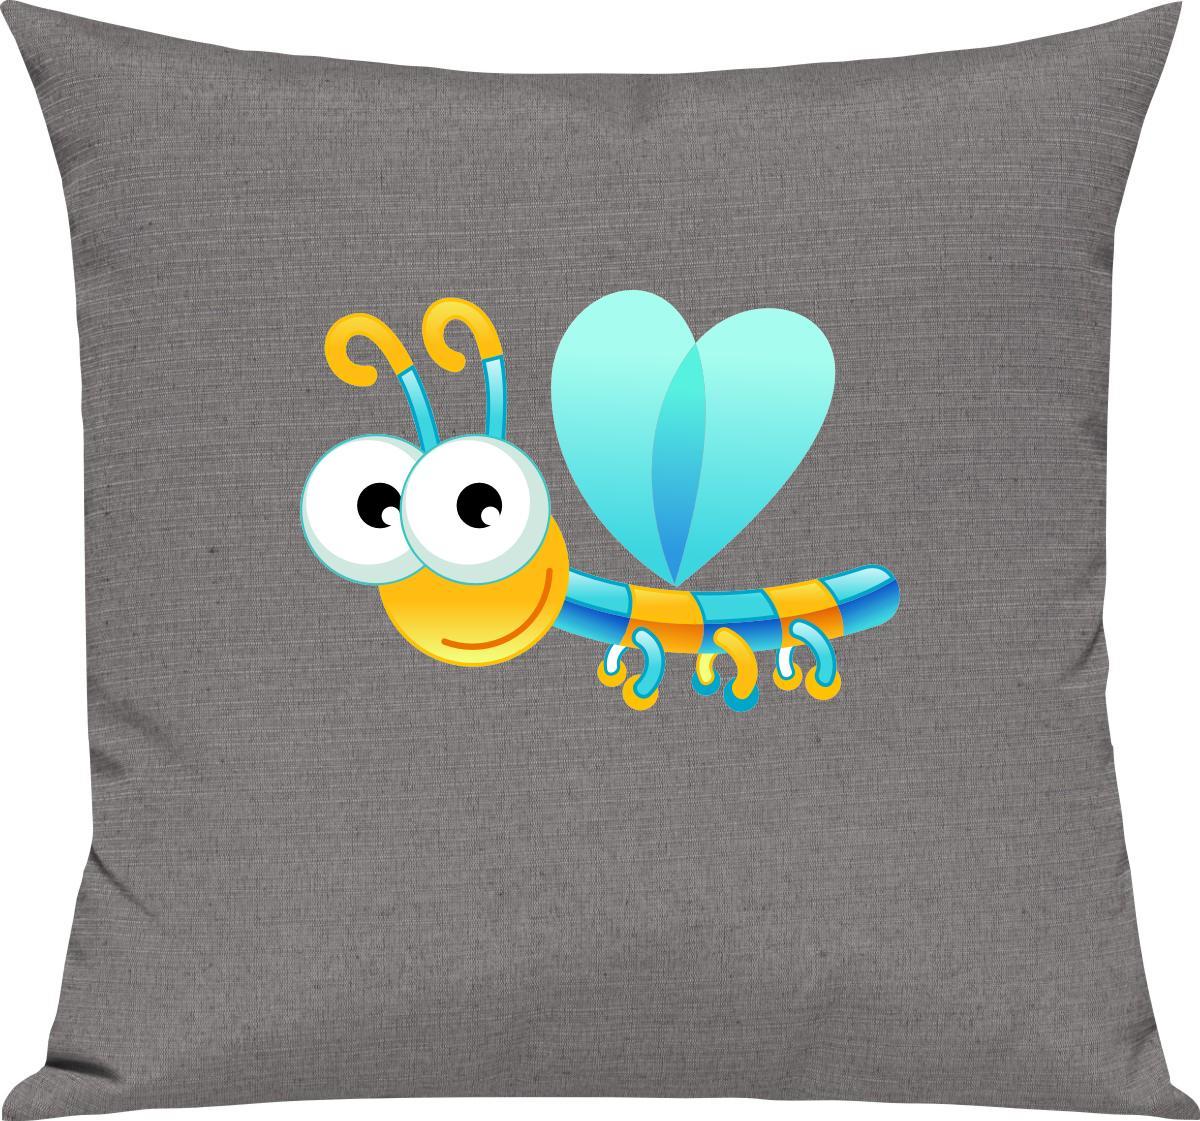 Indexbild 7 - Kinder Kissen, Libelle Insekt Tiere Tier Natur, Kuschelkissen Couch Deko,